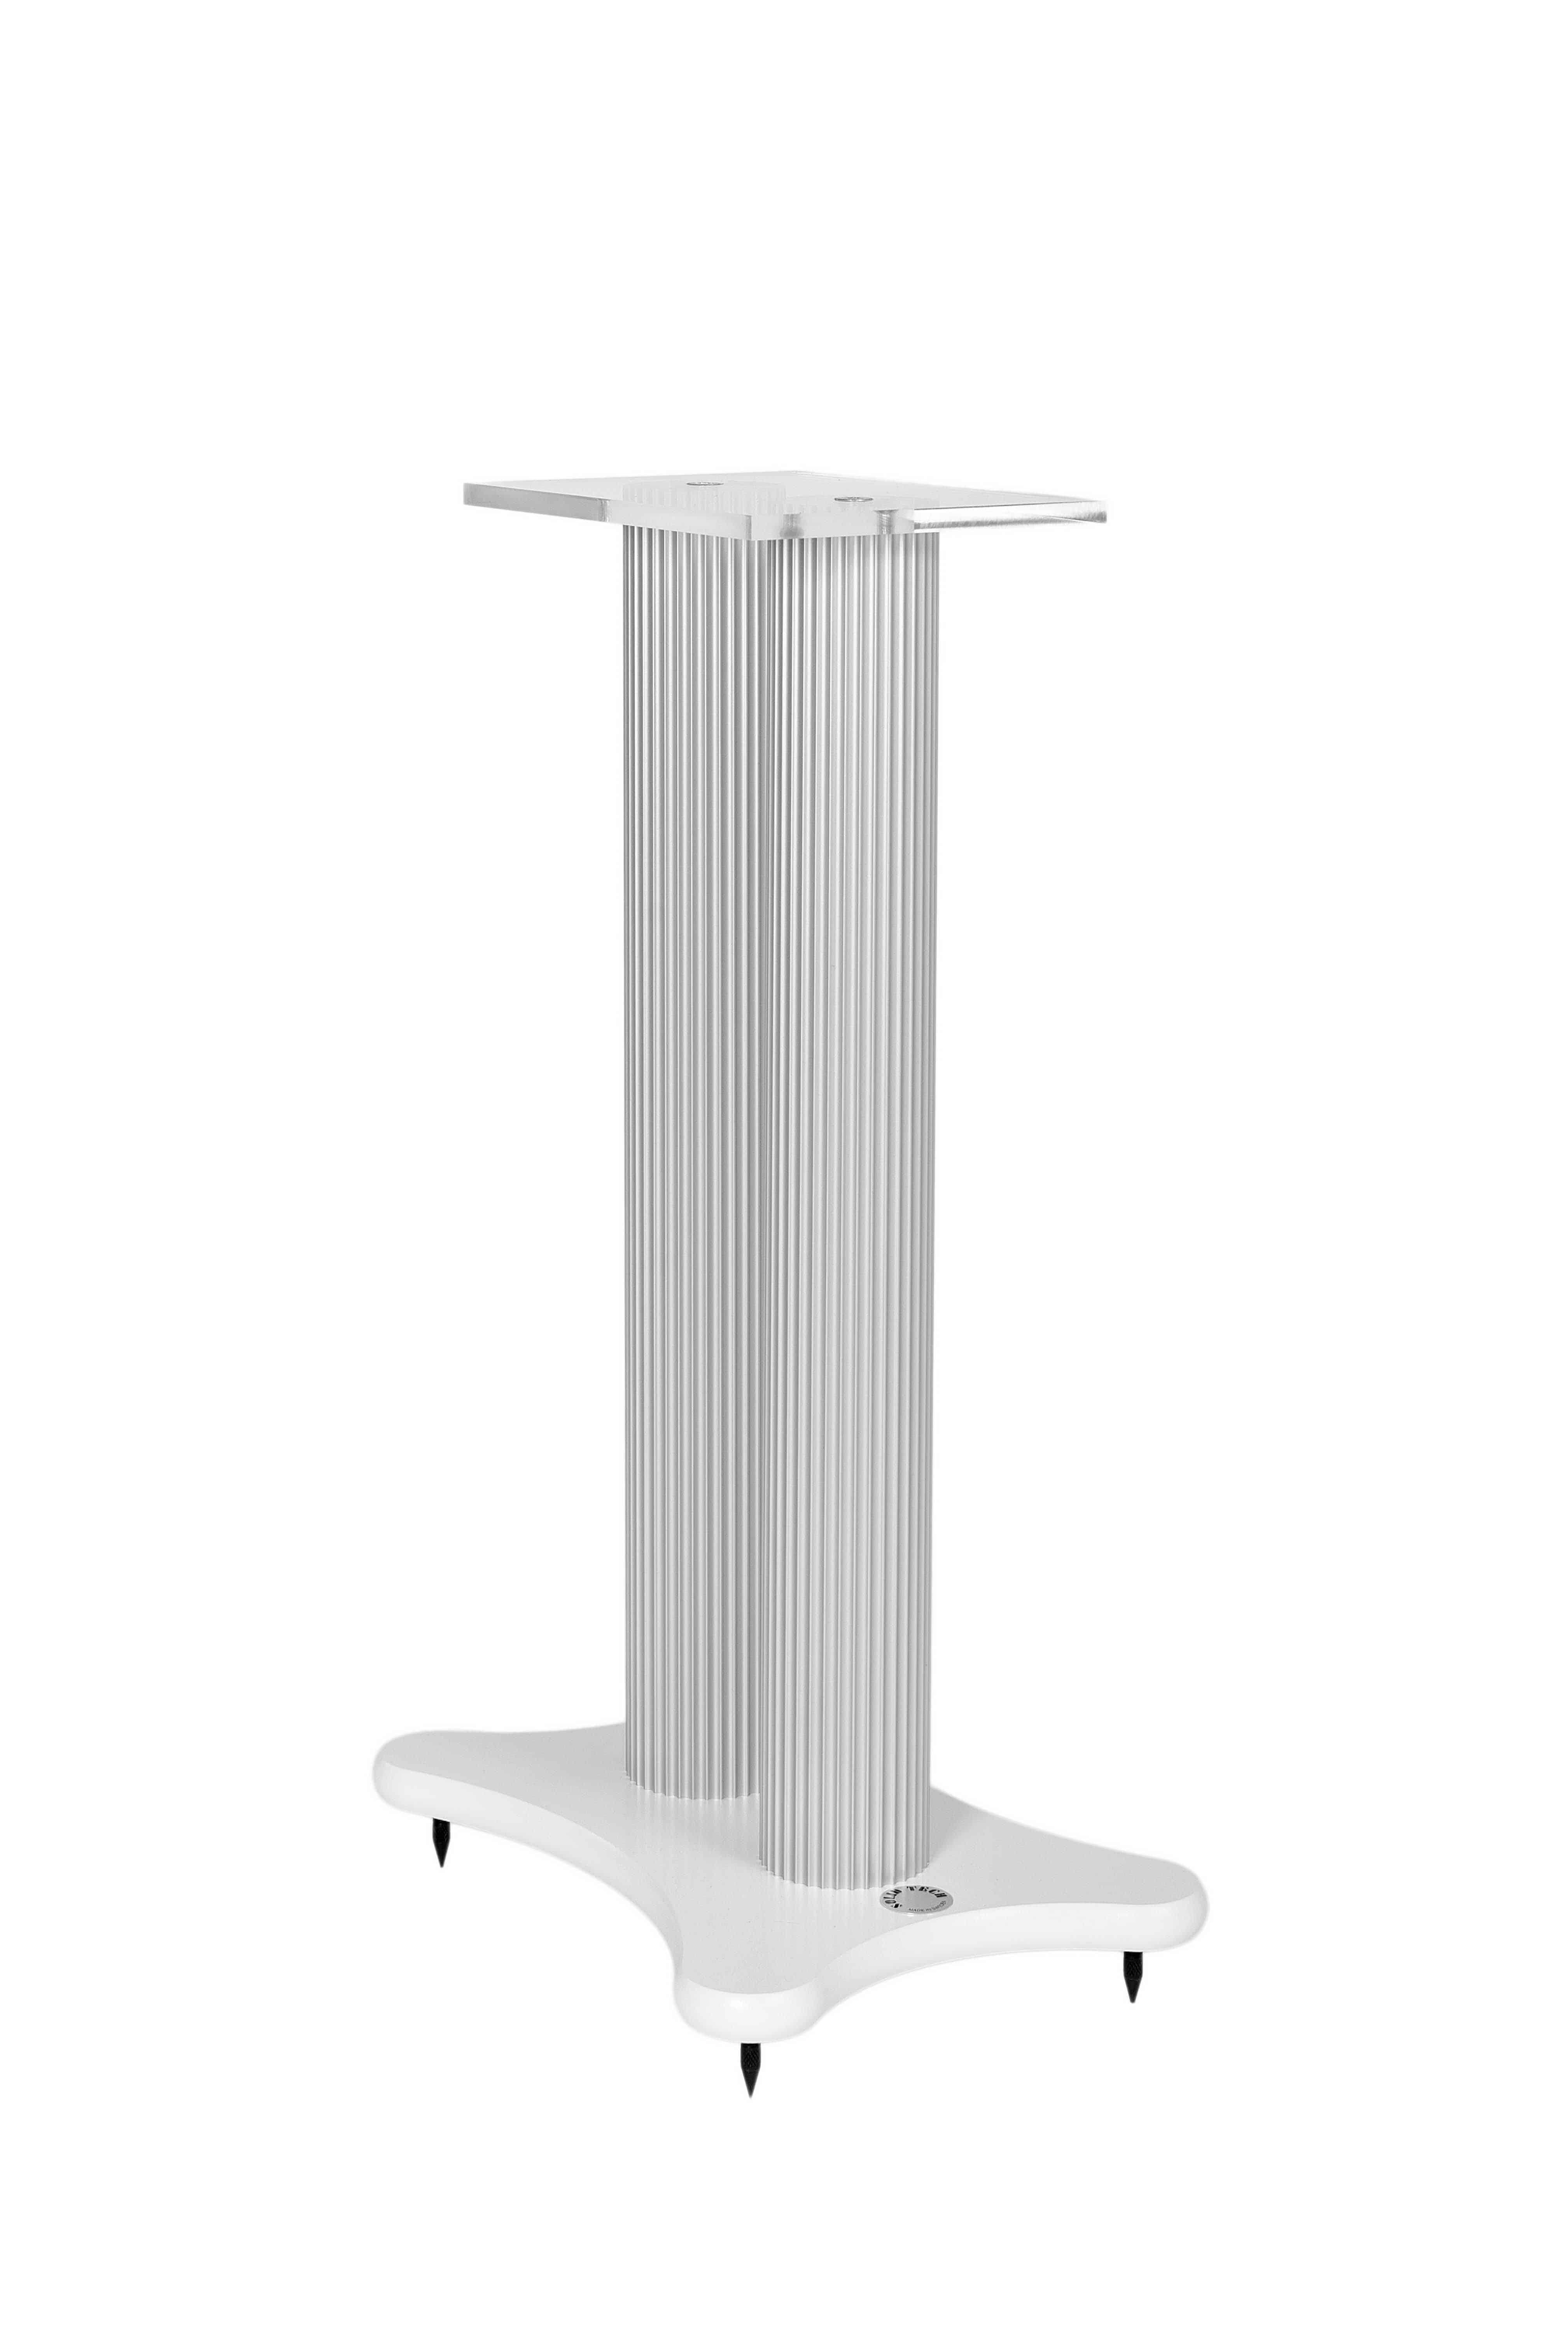 Speakerstand white fot and white pillars Image